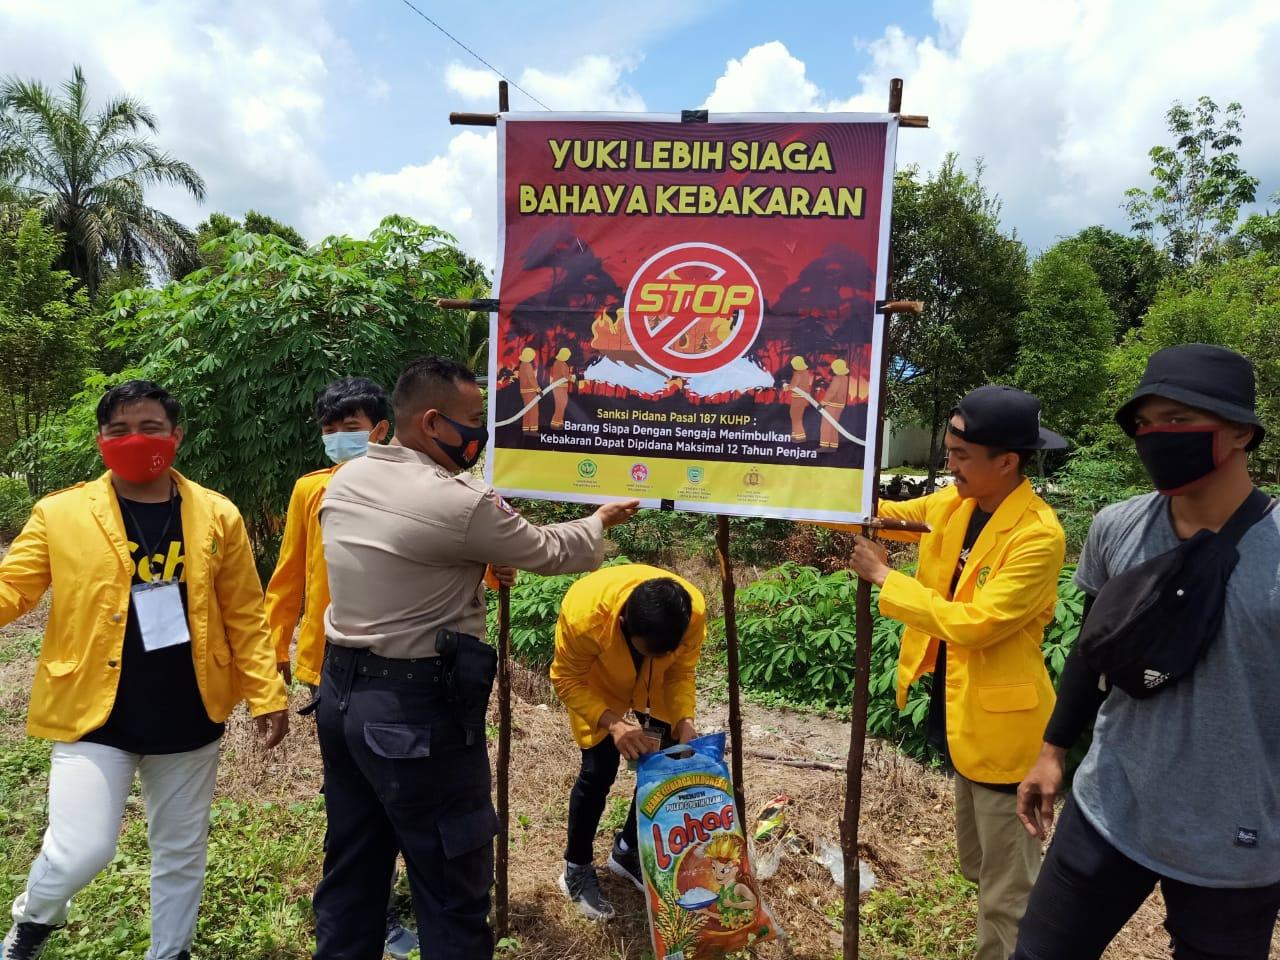 Cegah Karhutla, Bhabinkamtibmas Polsek Kahayan Tengah Bersama Mahasiswa KKN Pasang Spanduk Siaga Bahaya Kebakaran